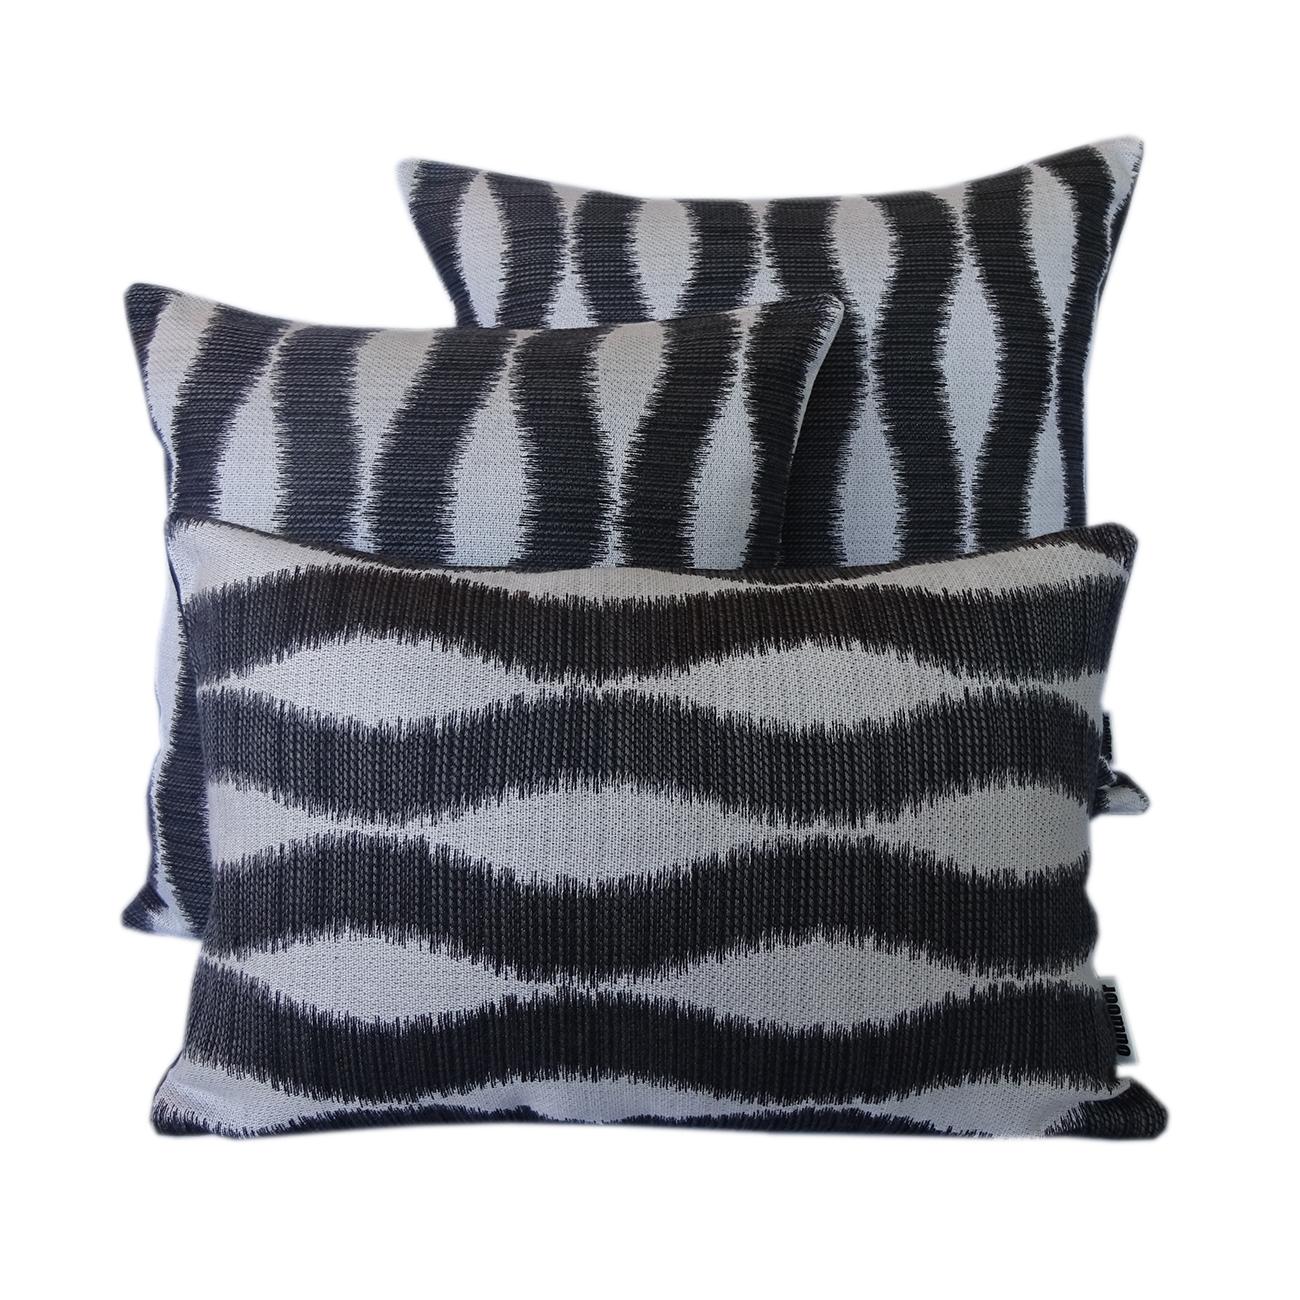 Bora Bora - Black - Outdoor Cushion - Outdoor Interiors Australia